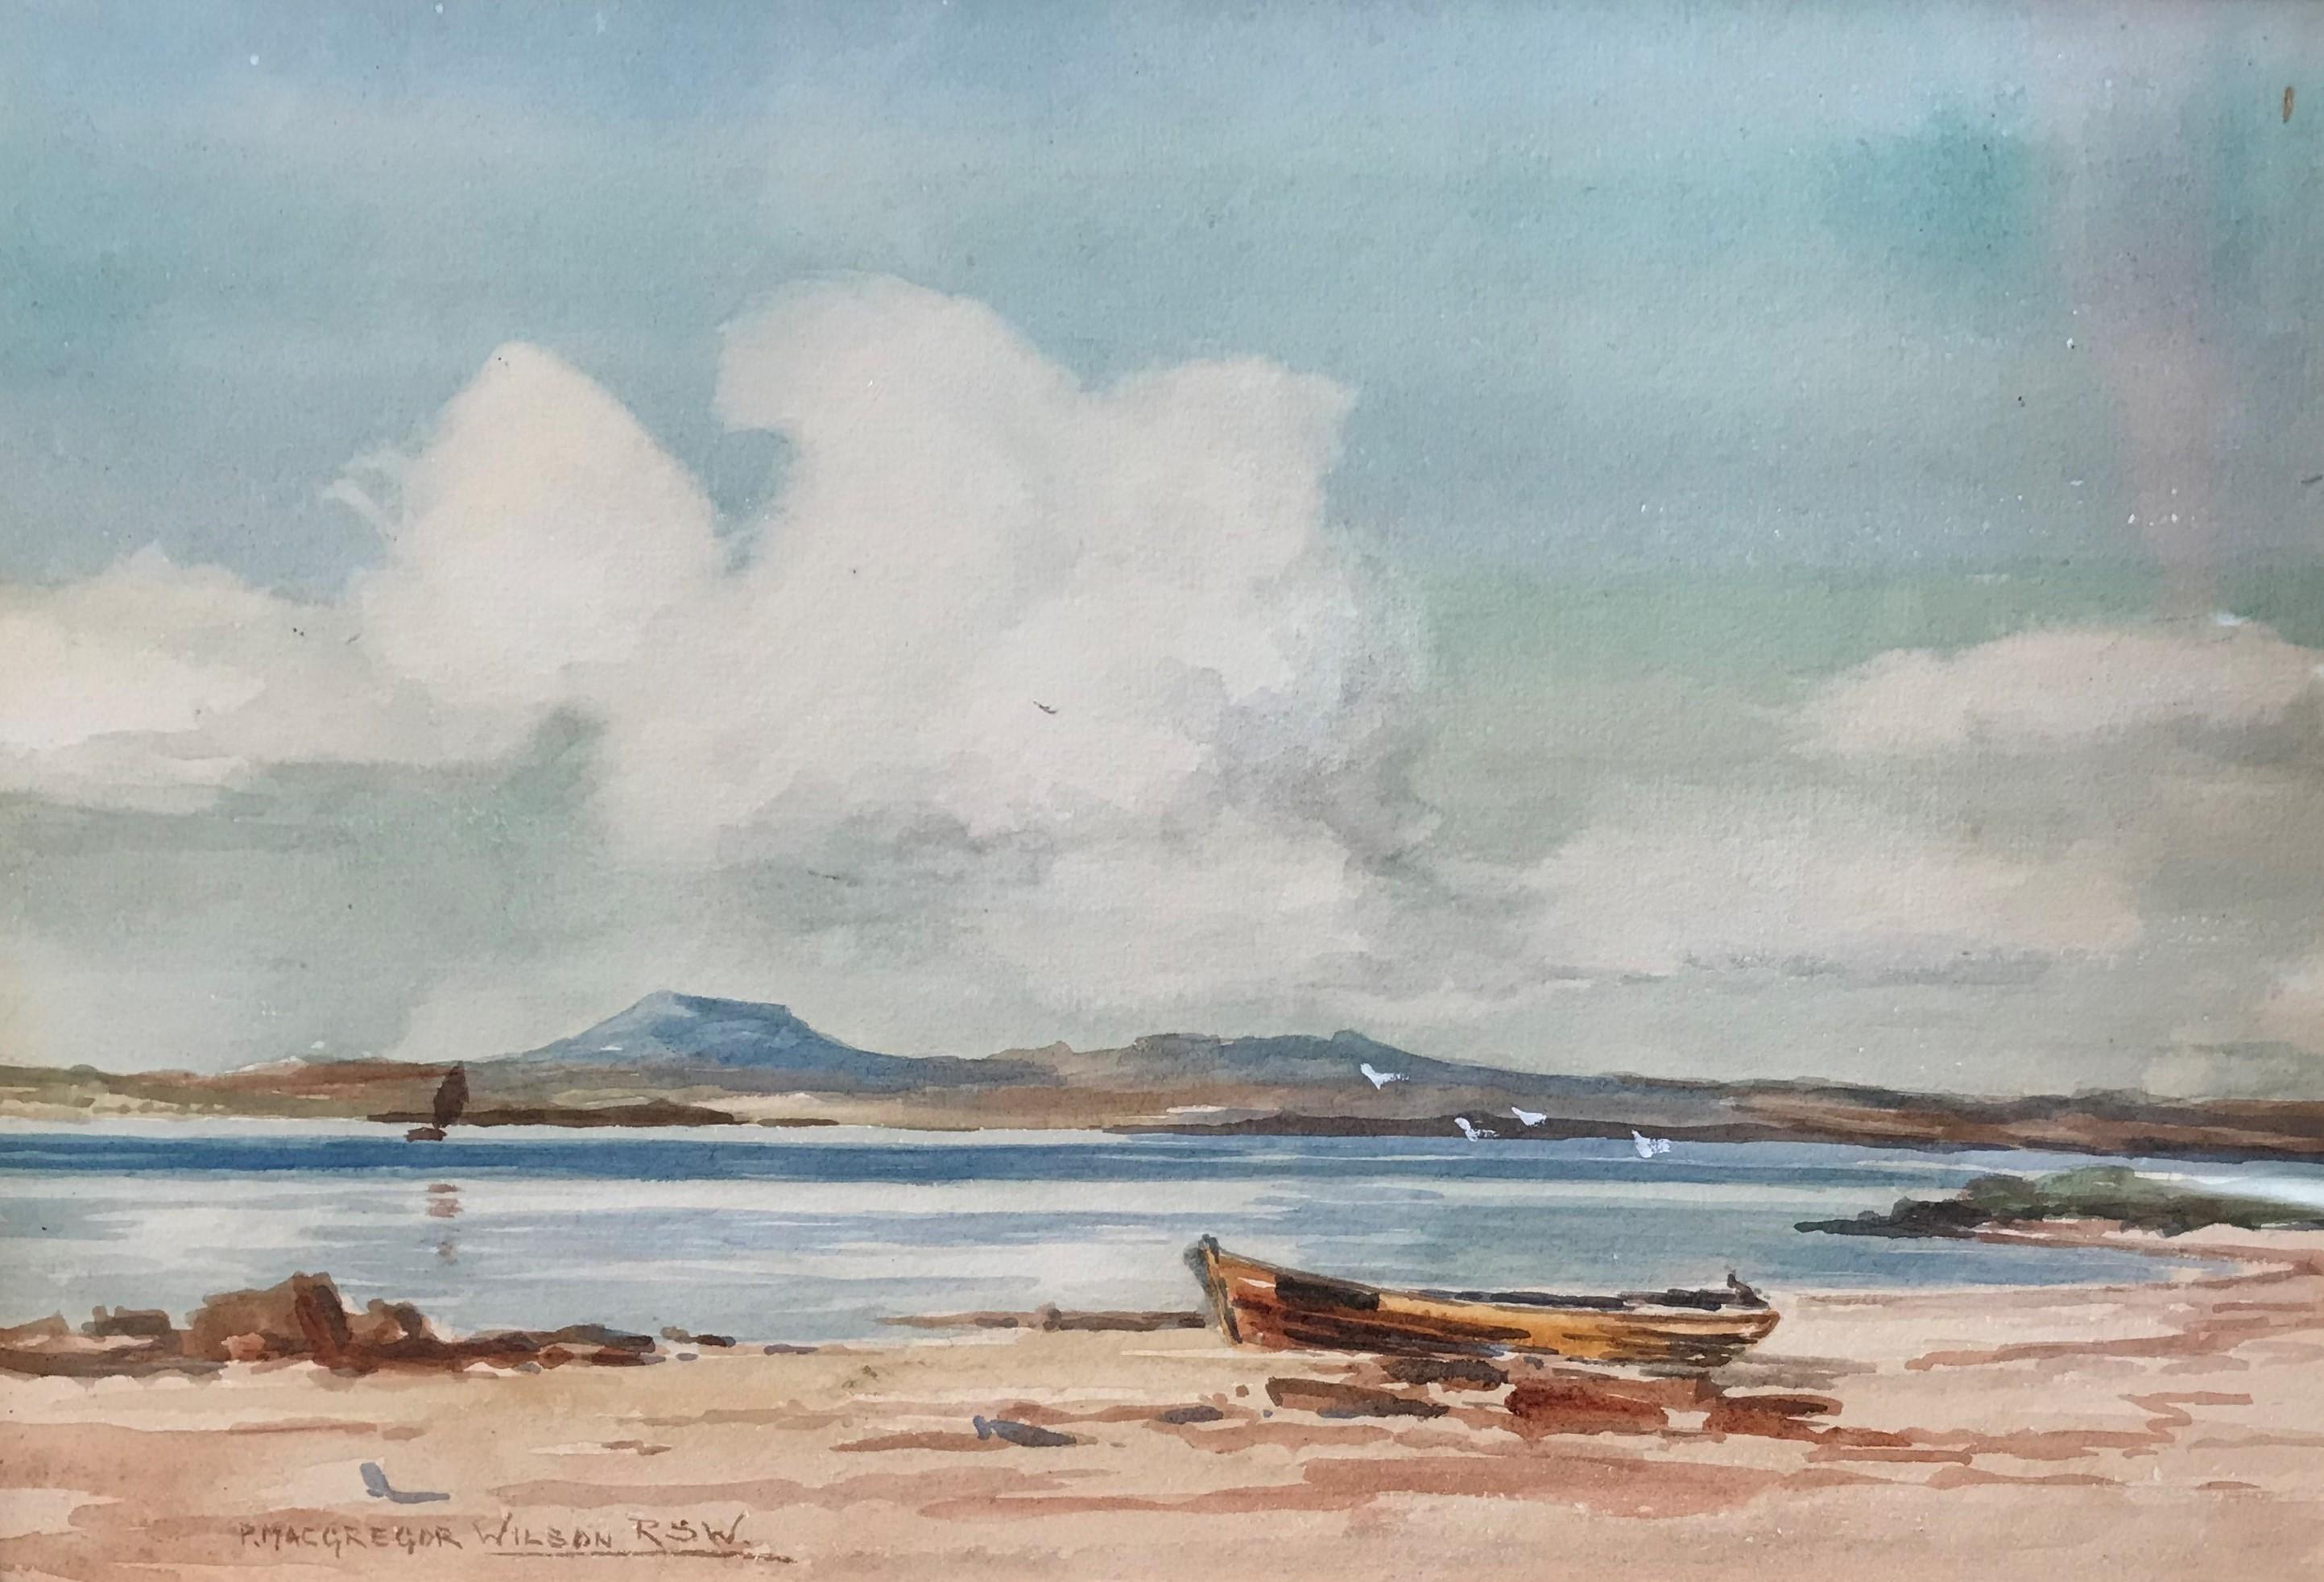 Peter Macgregor wilson -Bowmore Islay